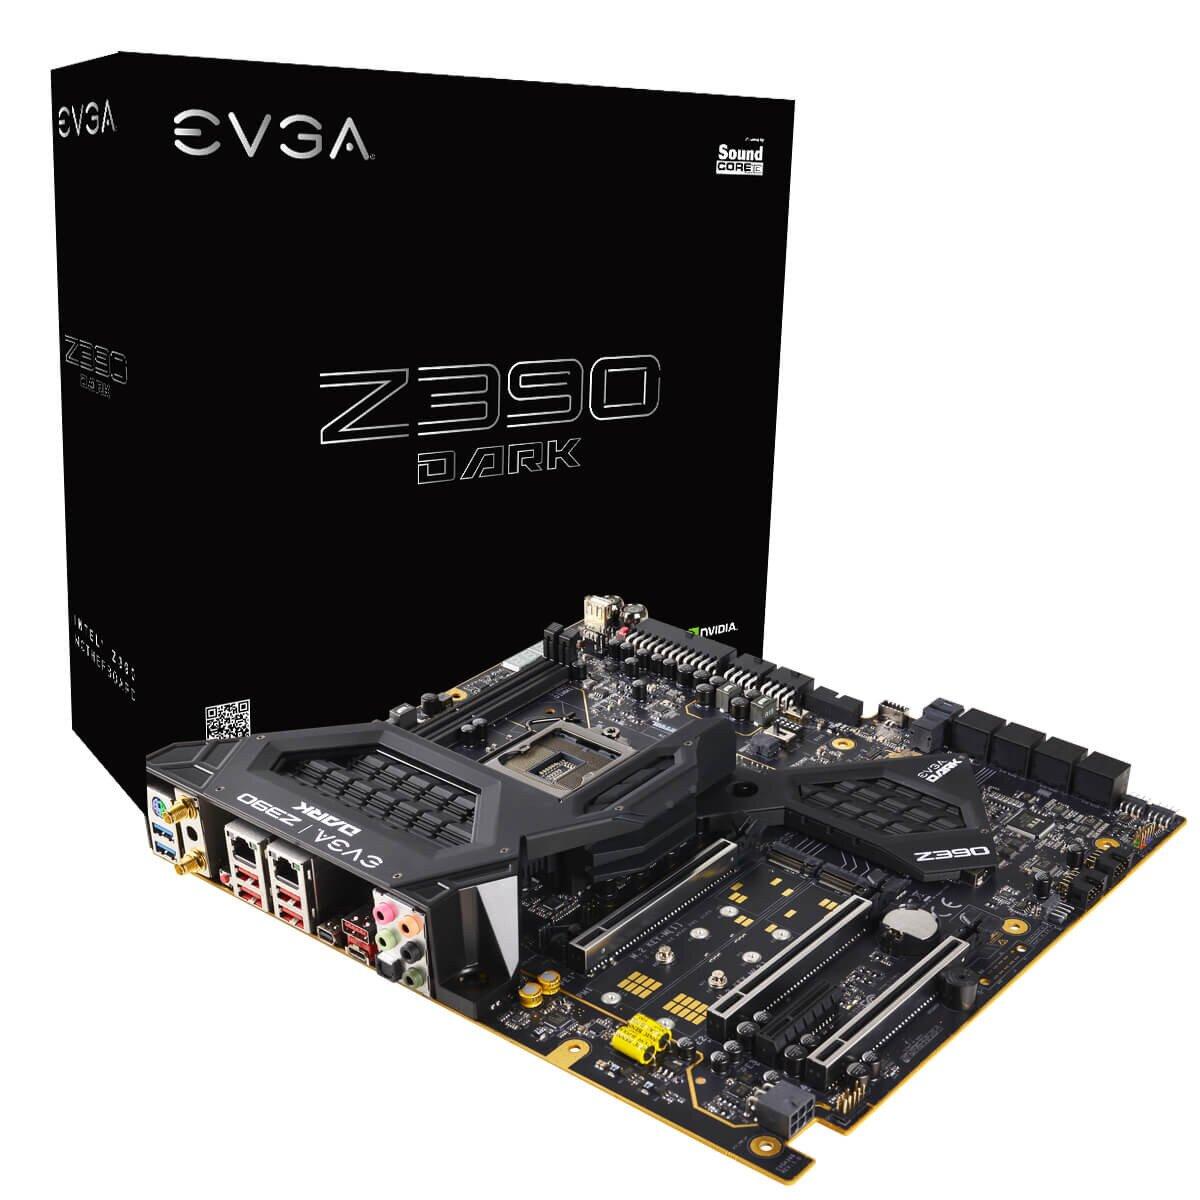 Buy EVGA Z390 DARK 131-CS-E399-KR Motherboard online in Pakistan ...